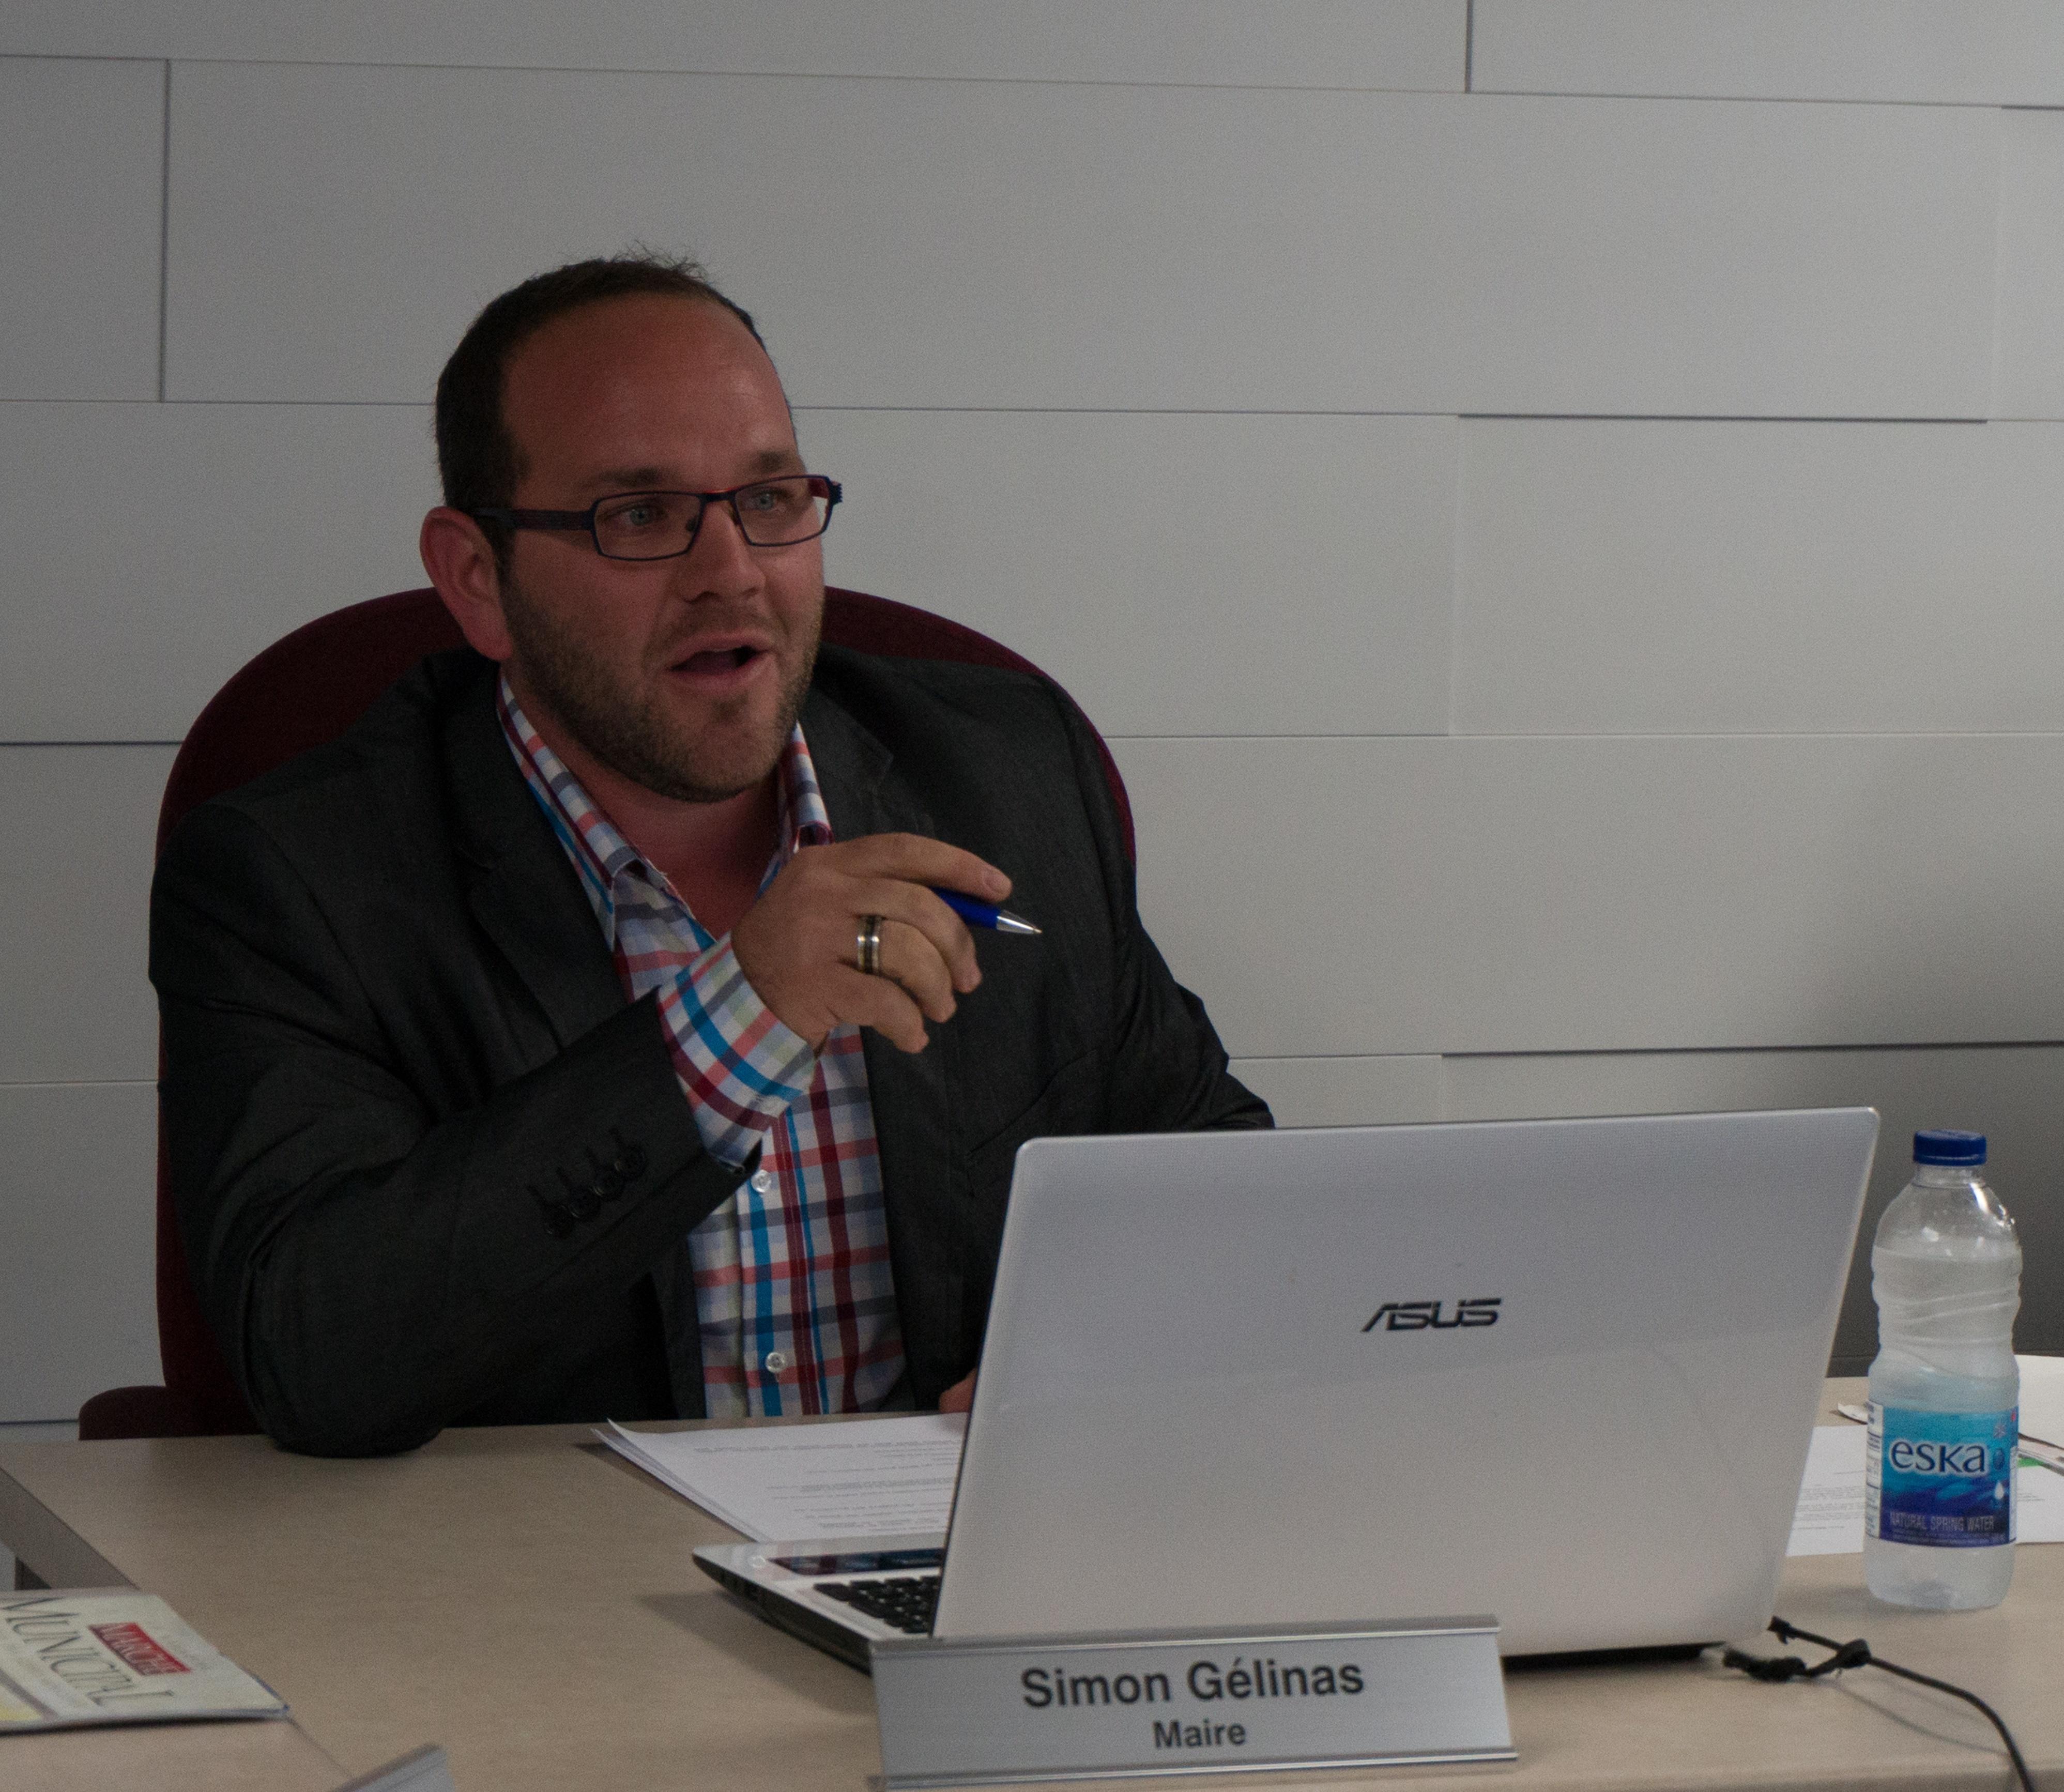 Simon Gélinas